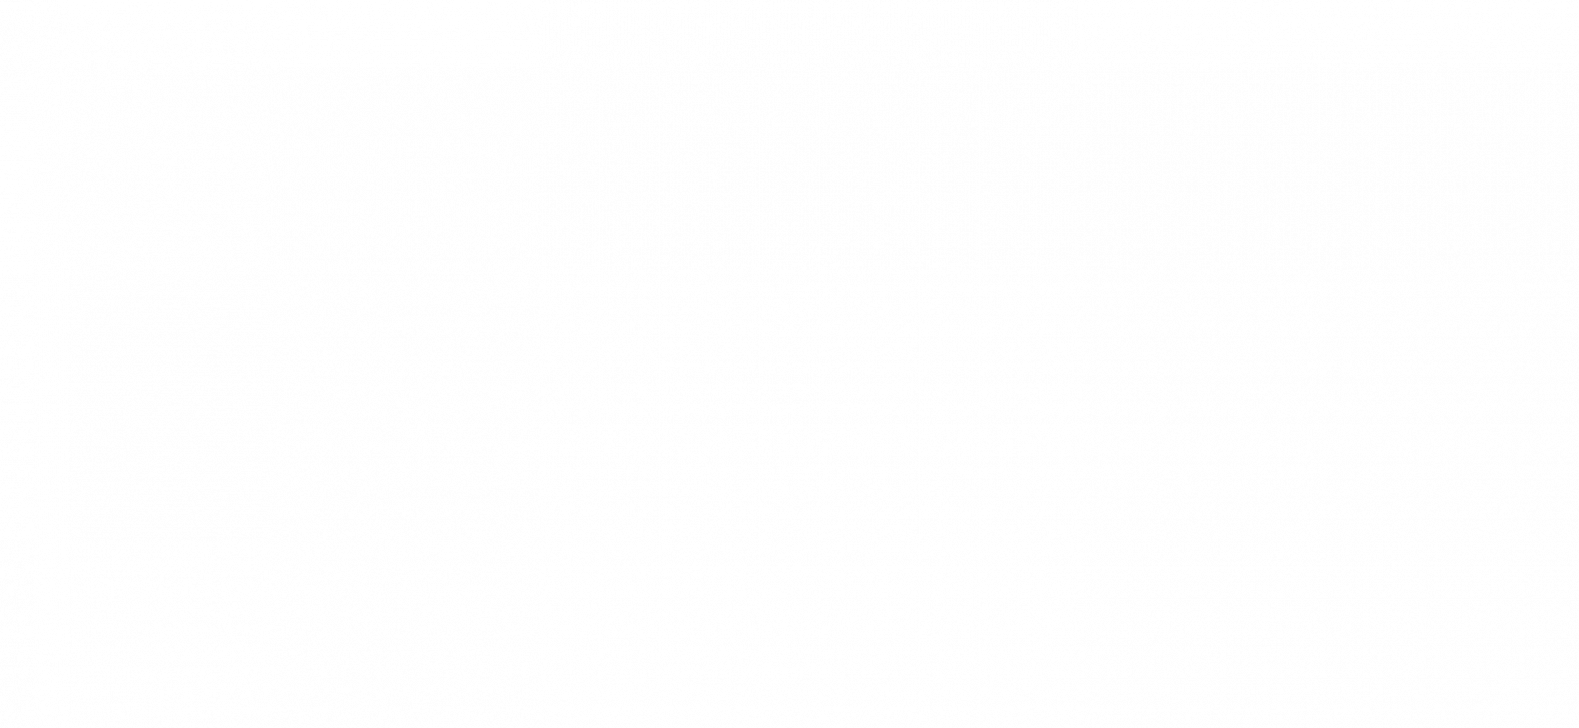 2015-07-07_014